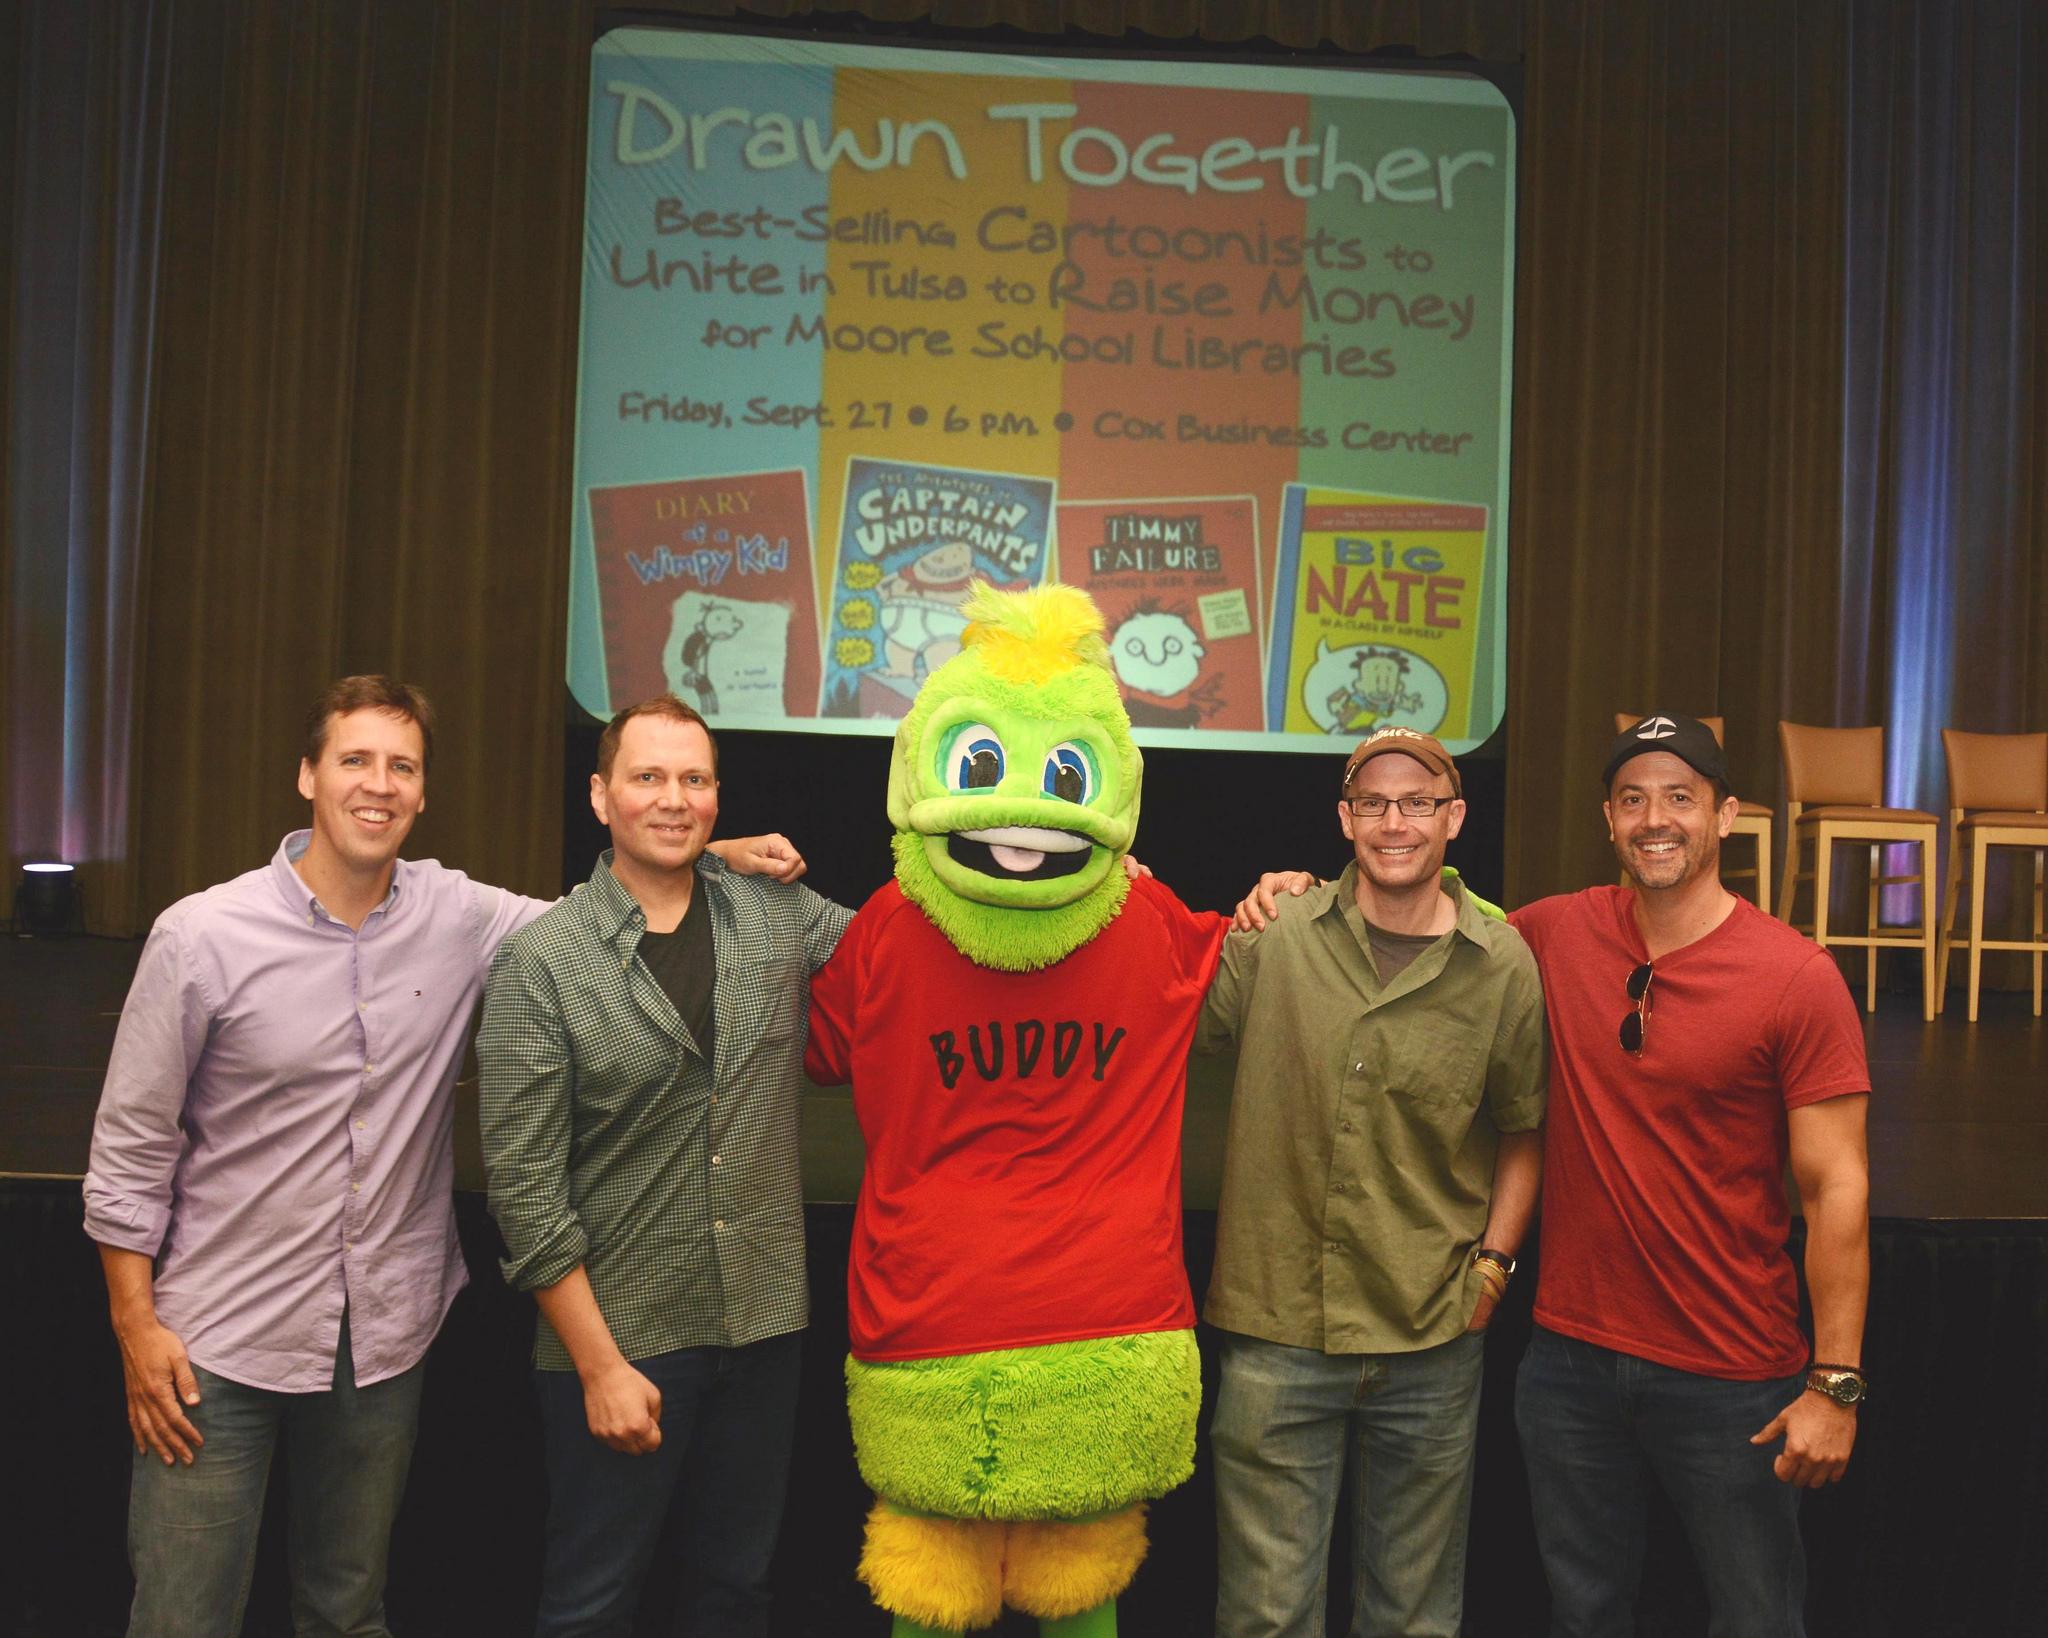 Kinney, Pierce, Buddy Bookworm, Pilkey & Pastis